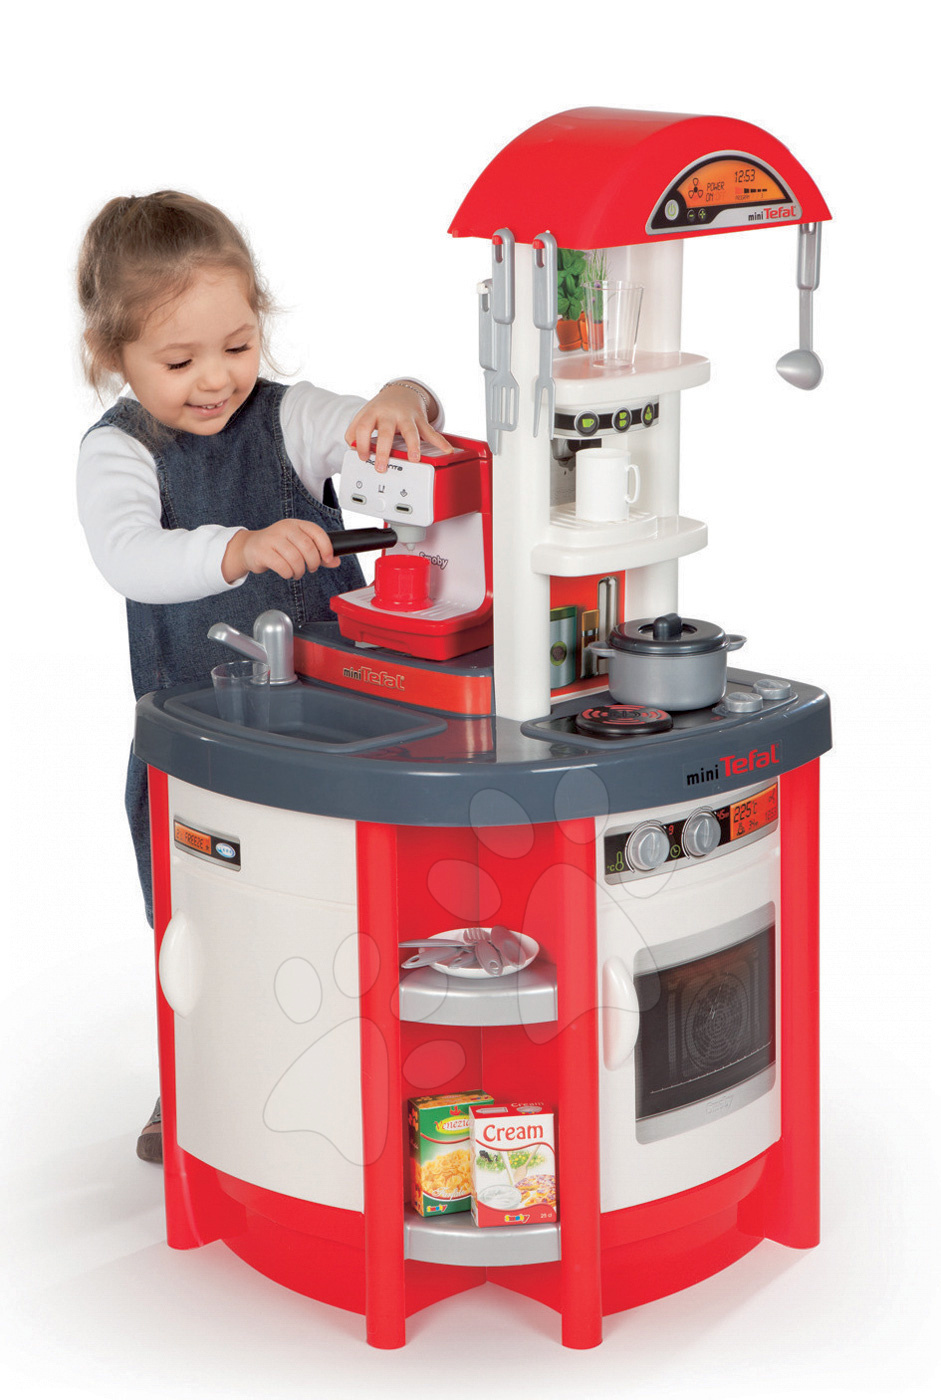 Kuchyňka Studio Tefal Smoby elektronická se zvuky, a kávovarem Espresso Rowenta a 19 doplňky červená